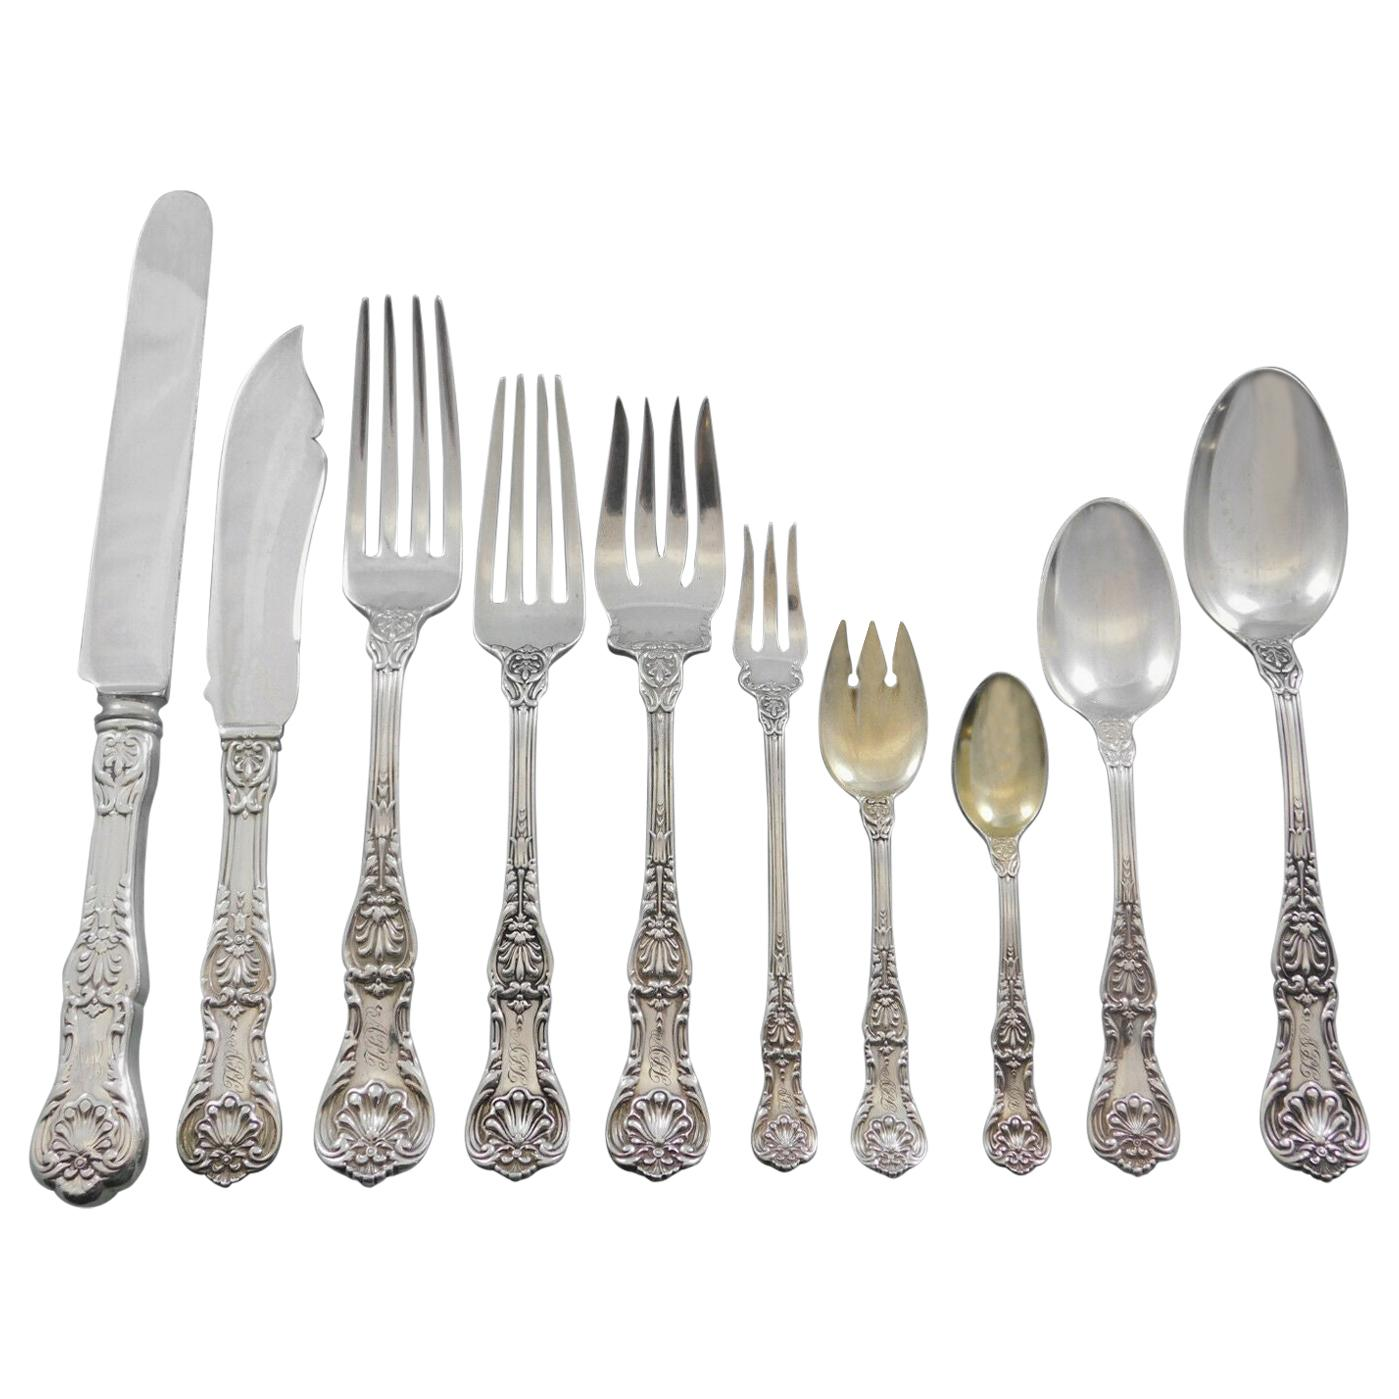 King George by Gorham Sterling Silver Flatware Set for 8 Service 85 Pcs Dinner